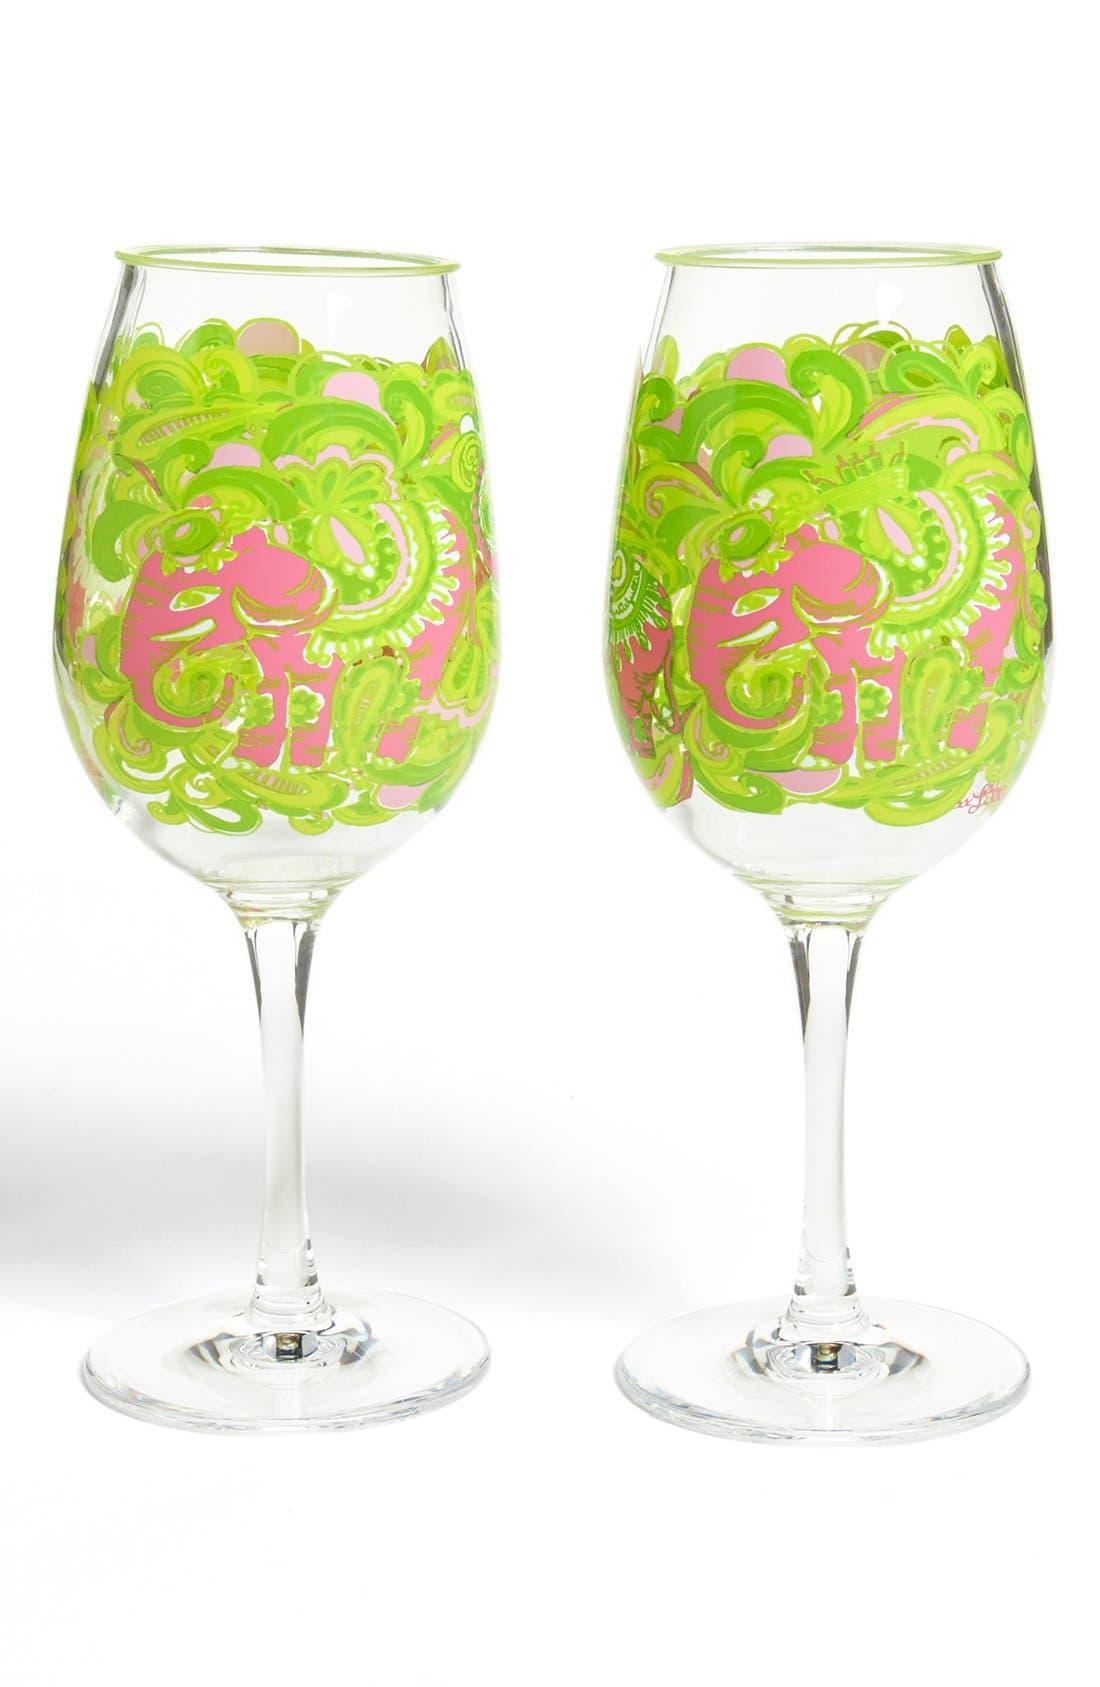 Main Image - Lilly Pulitzer® Print Acrylic Wine Glasses (Set of 2)